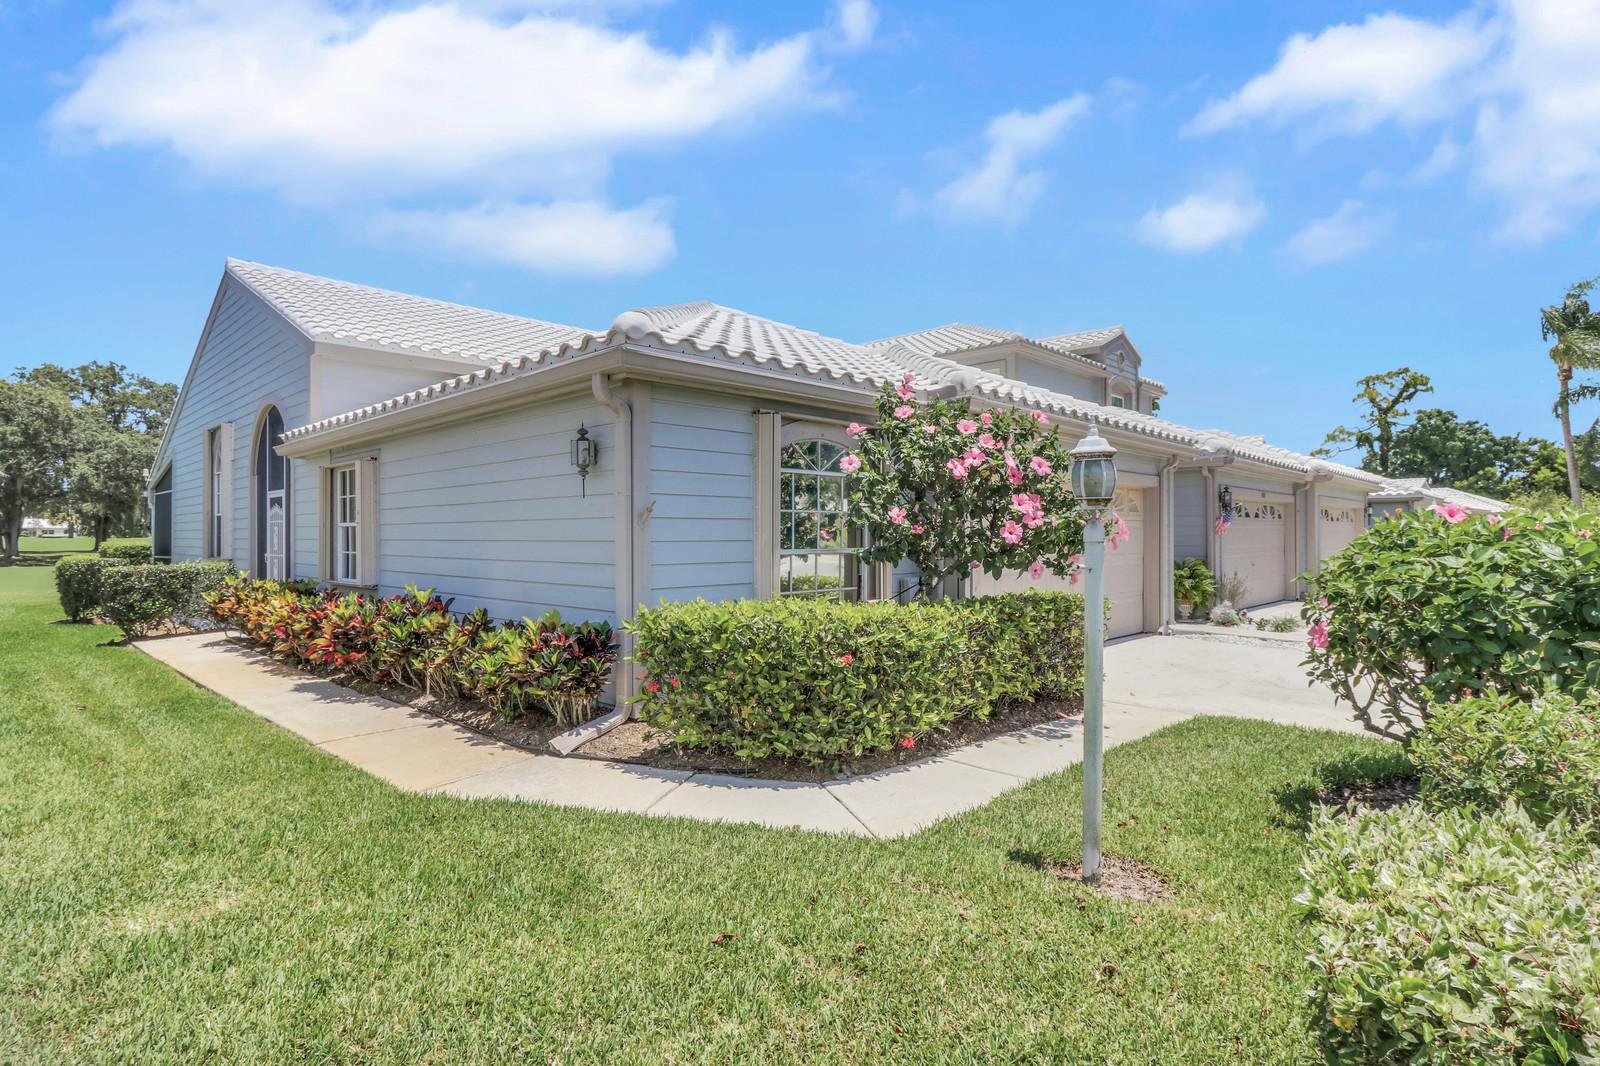 8945 Se Riverfront Terrace, Tequesta, FL 33469